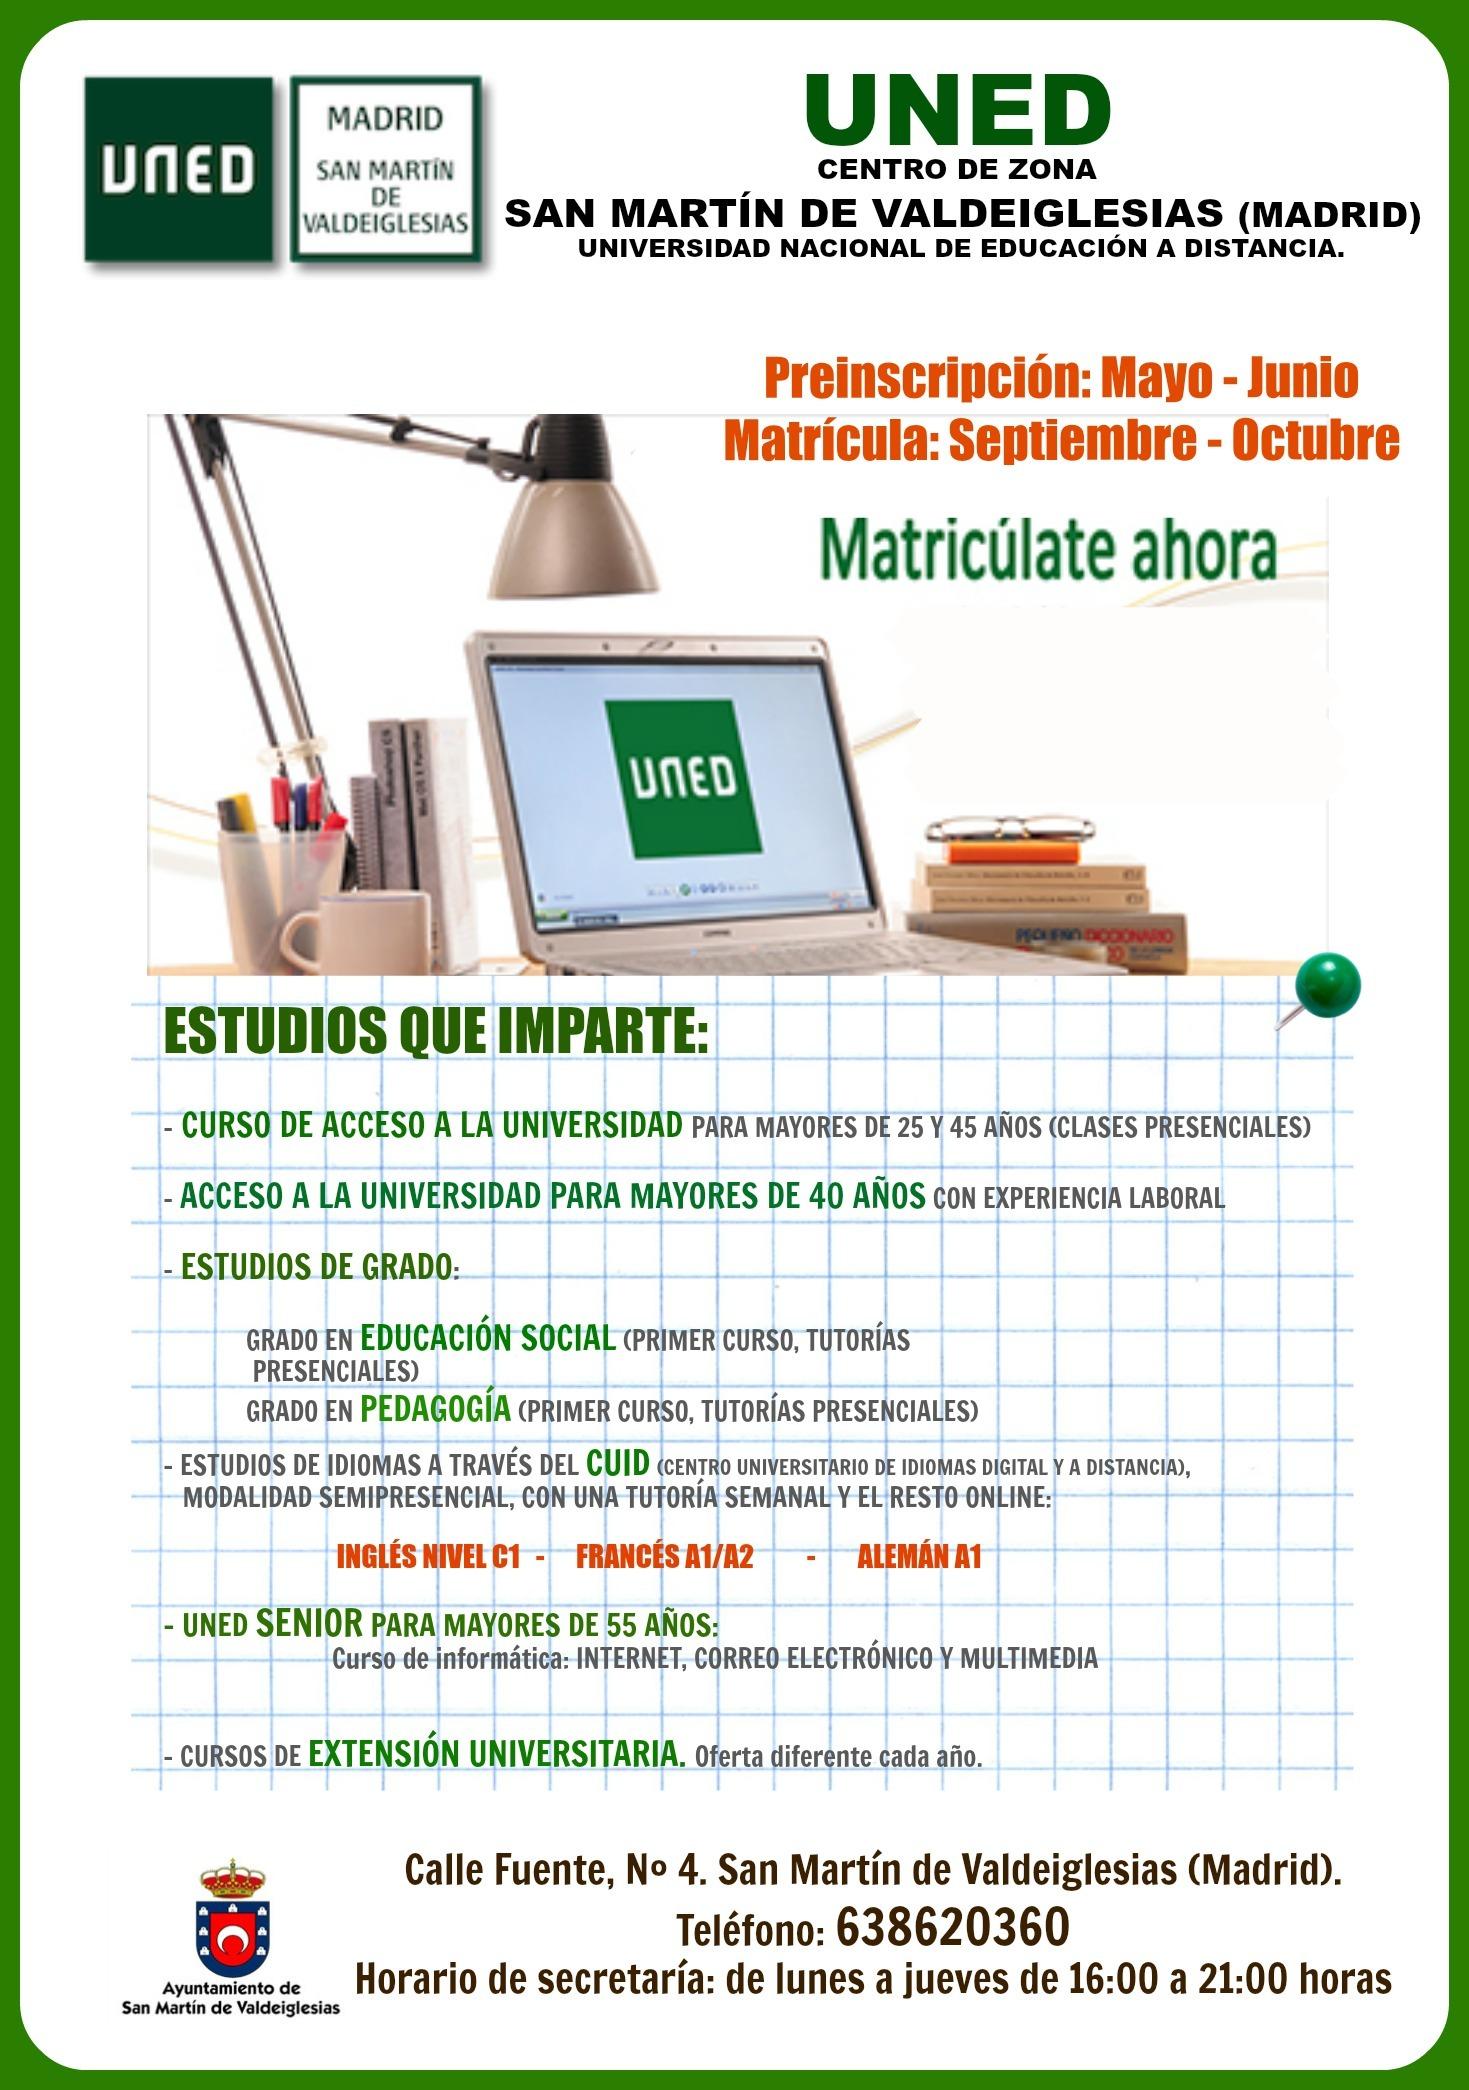 uned idiomas madrid: